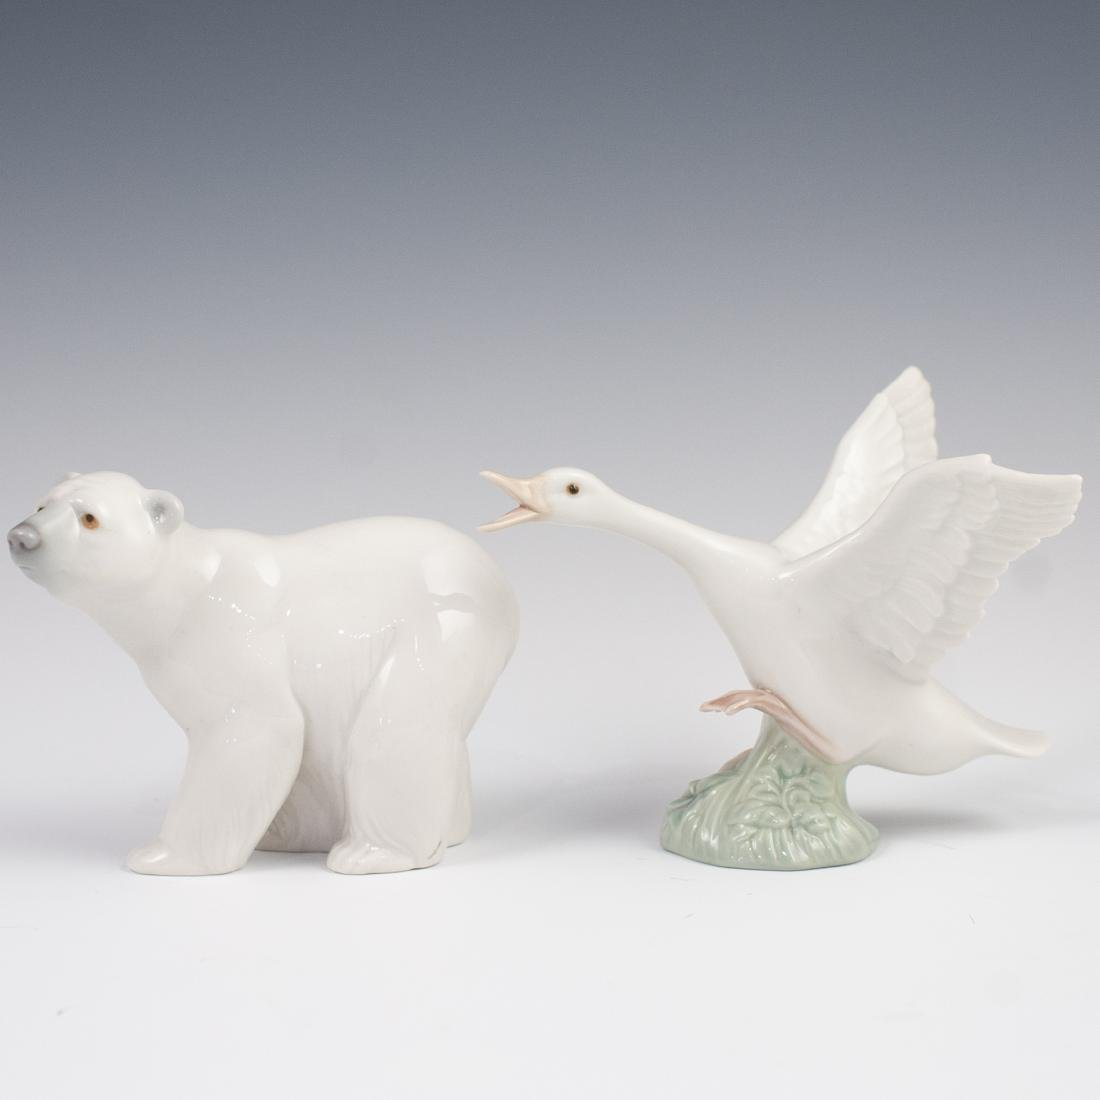 (4) Vintage Porcelain Lladro Figurines - 4